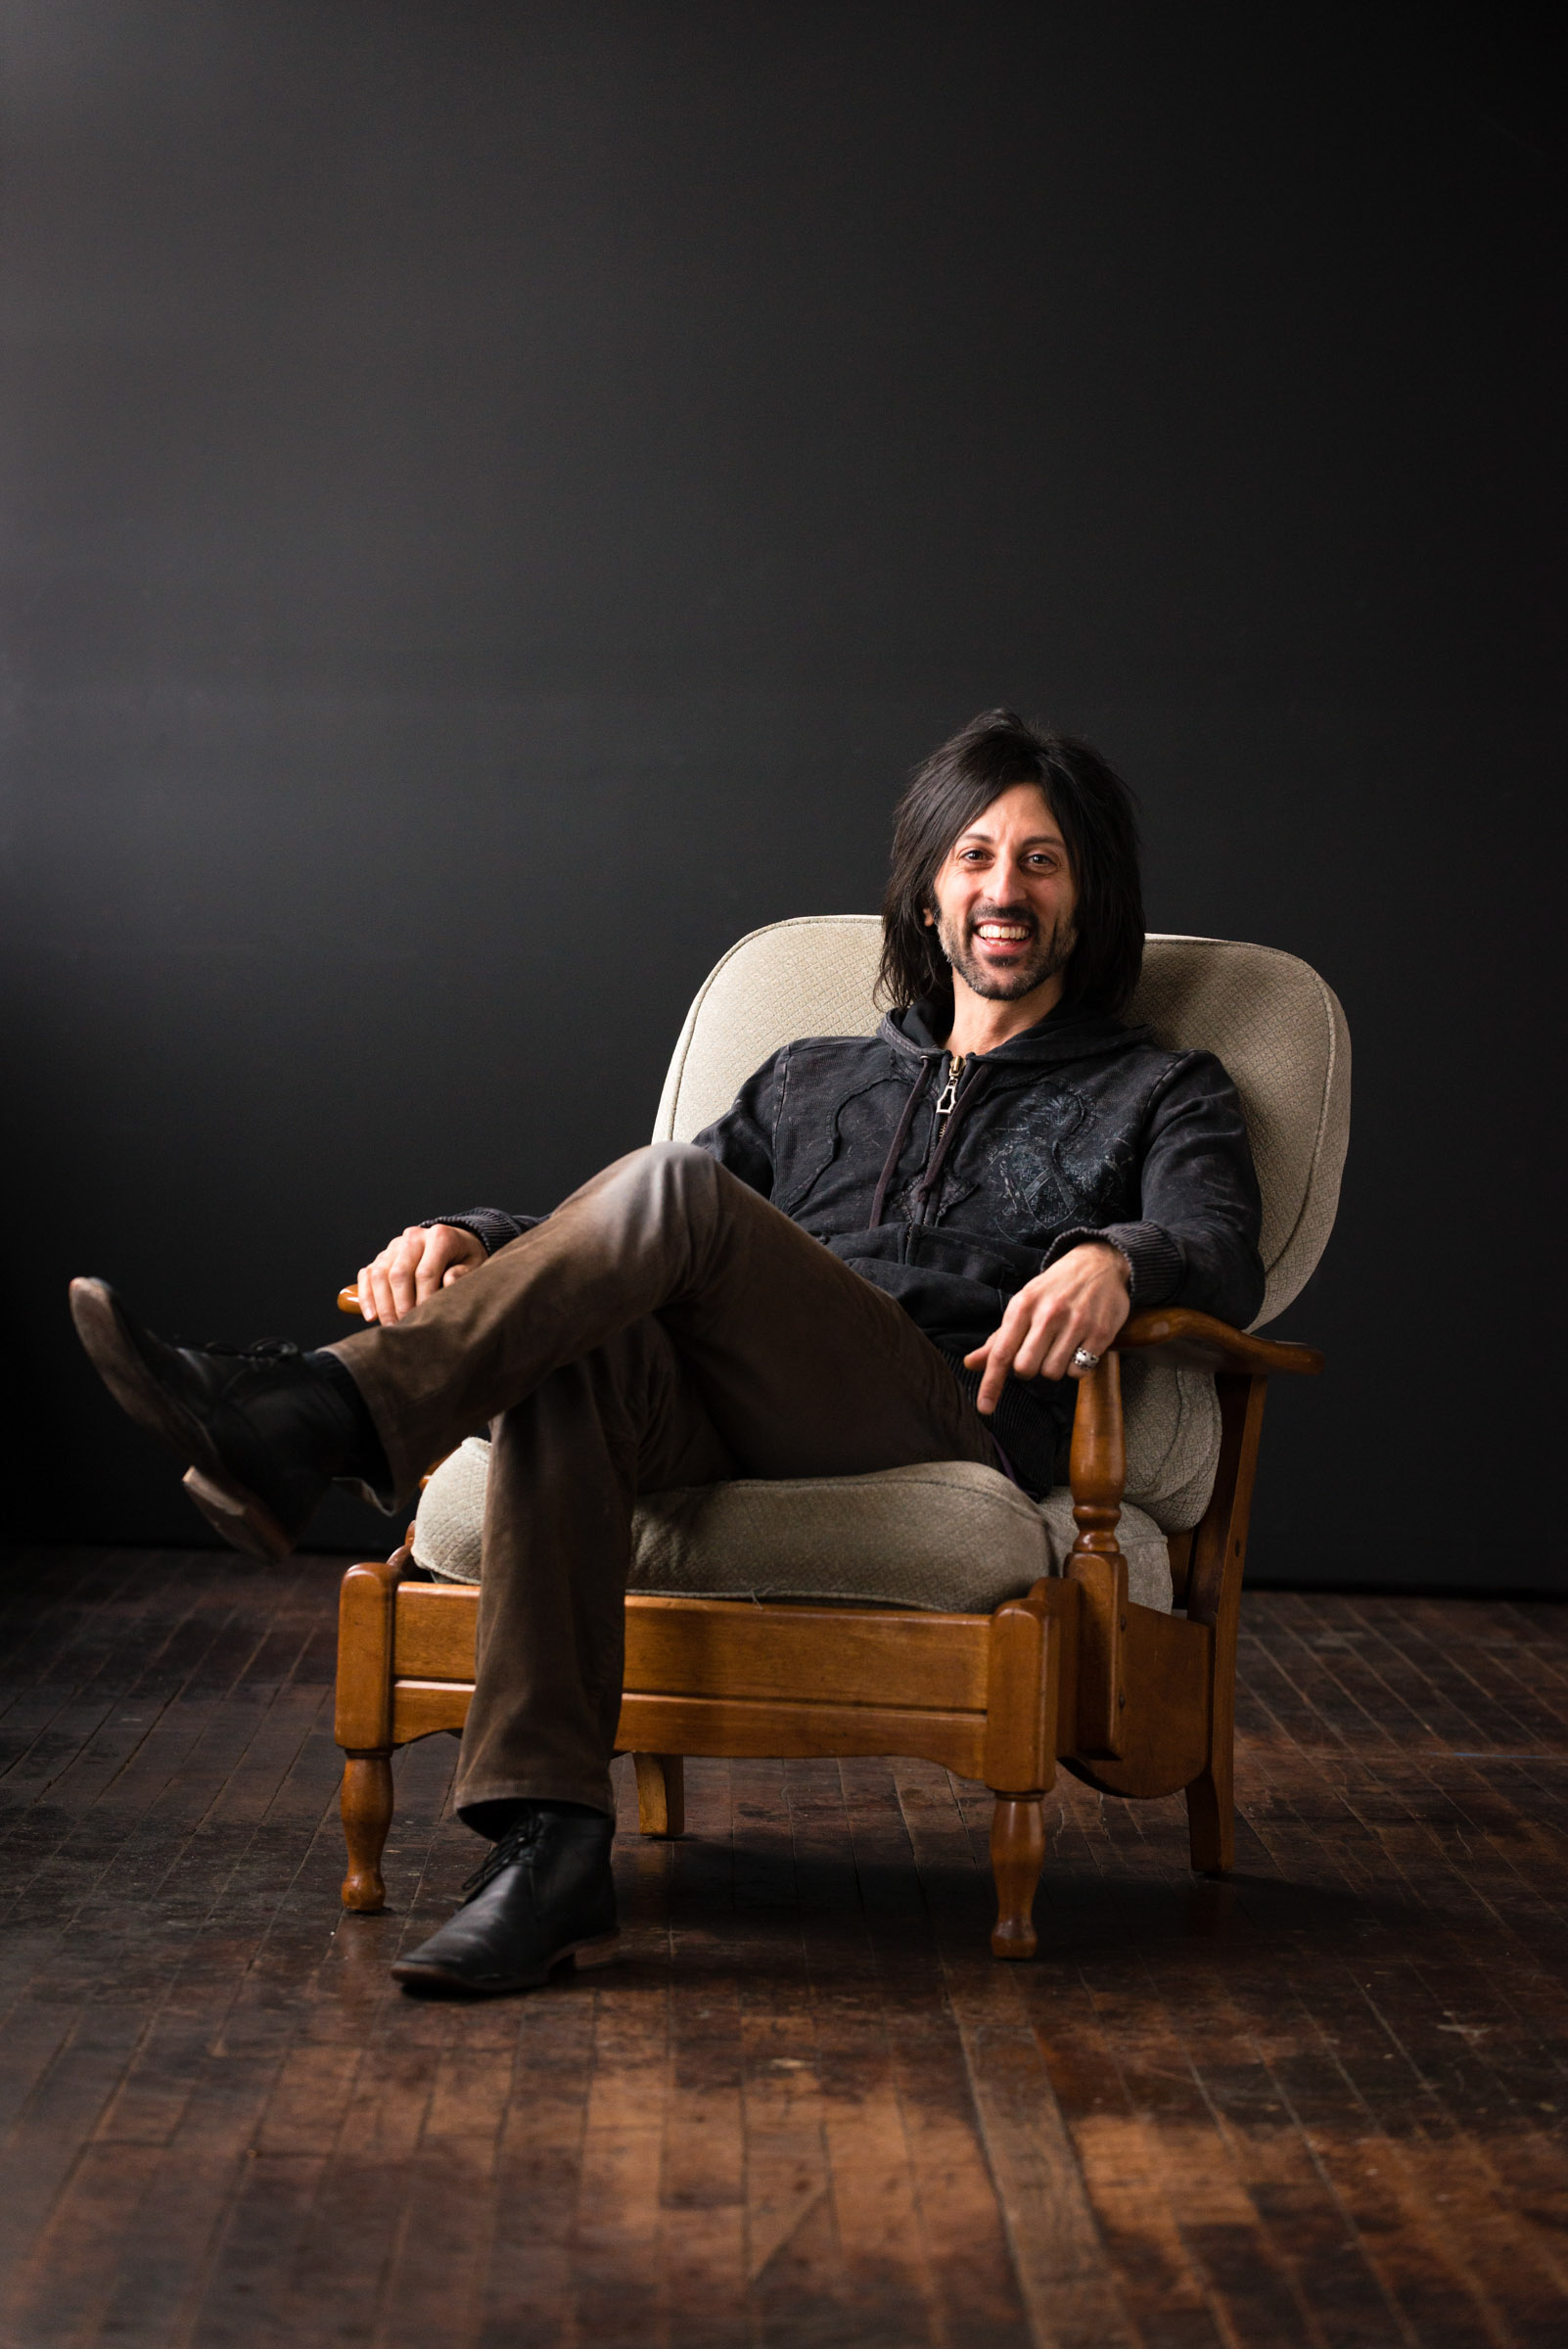 Cleveland-Portrait-Photographer-Angelo-Merendino161.jpg